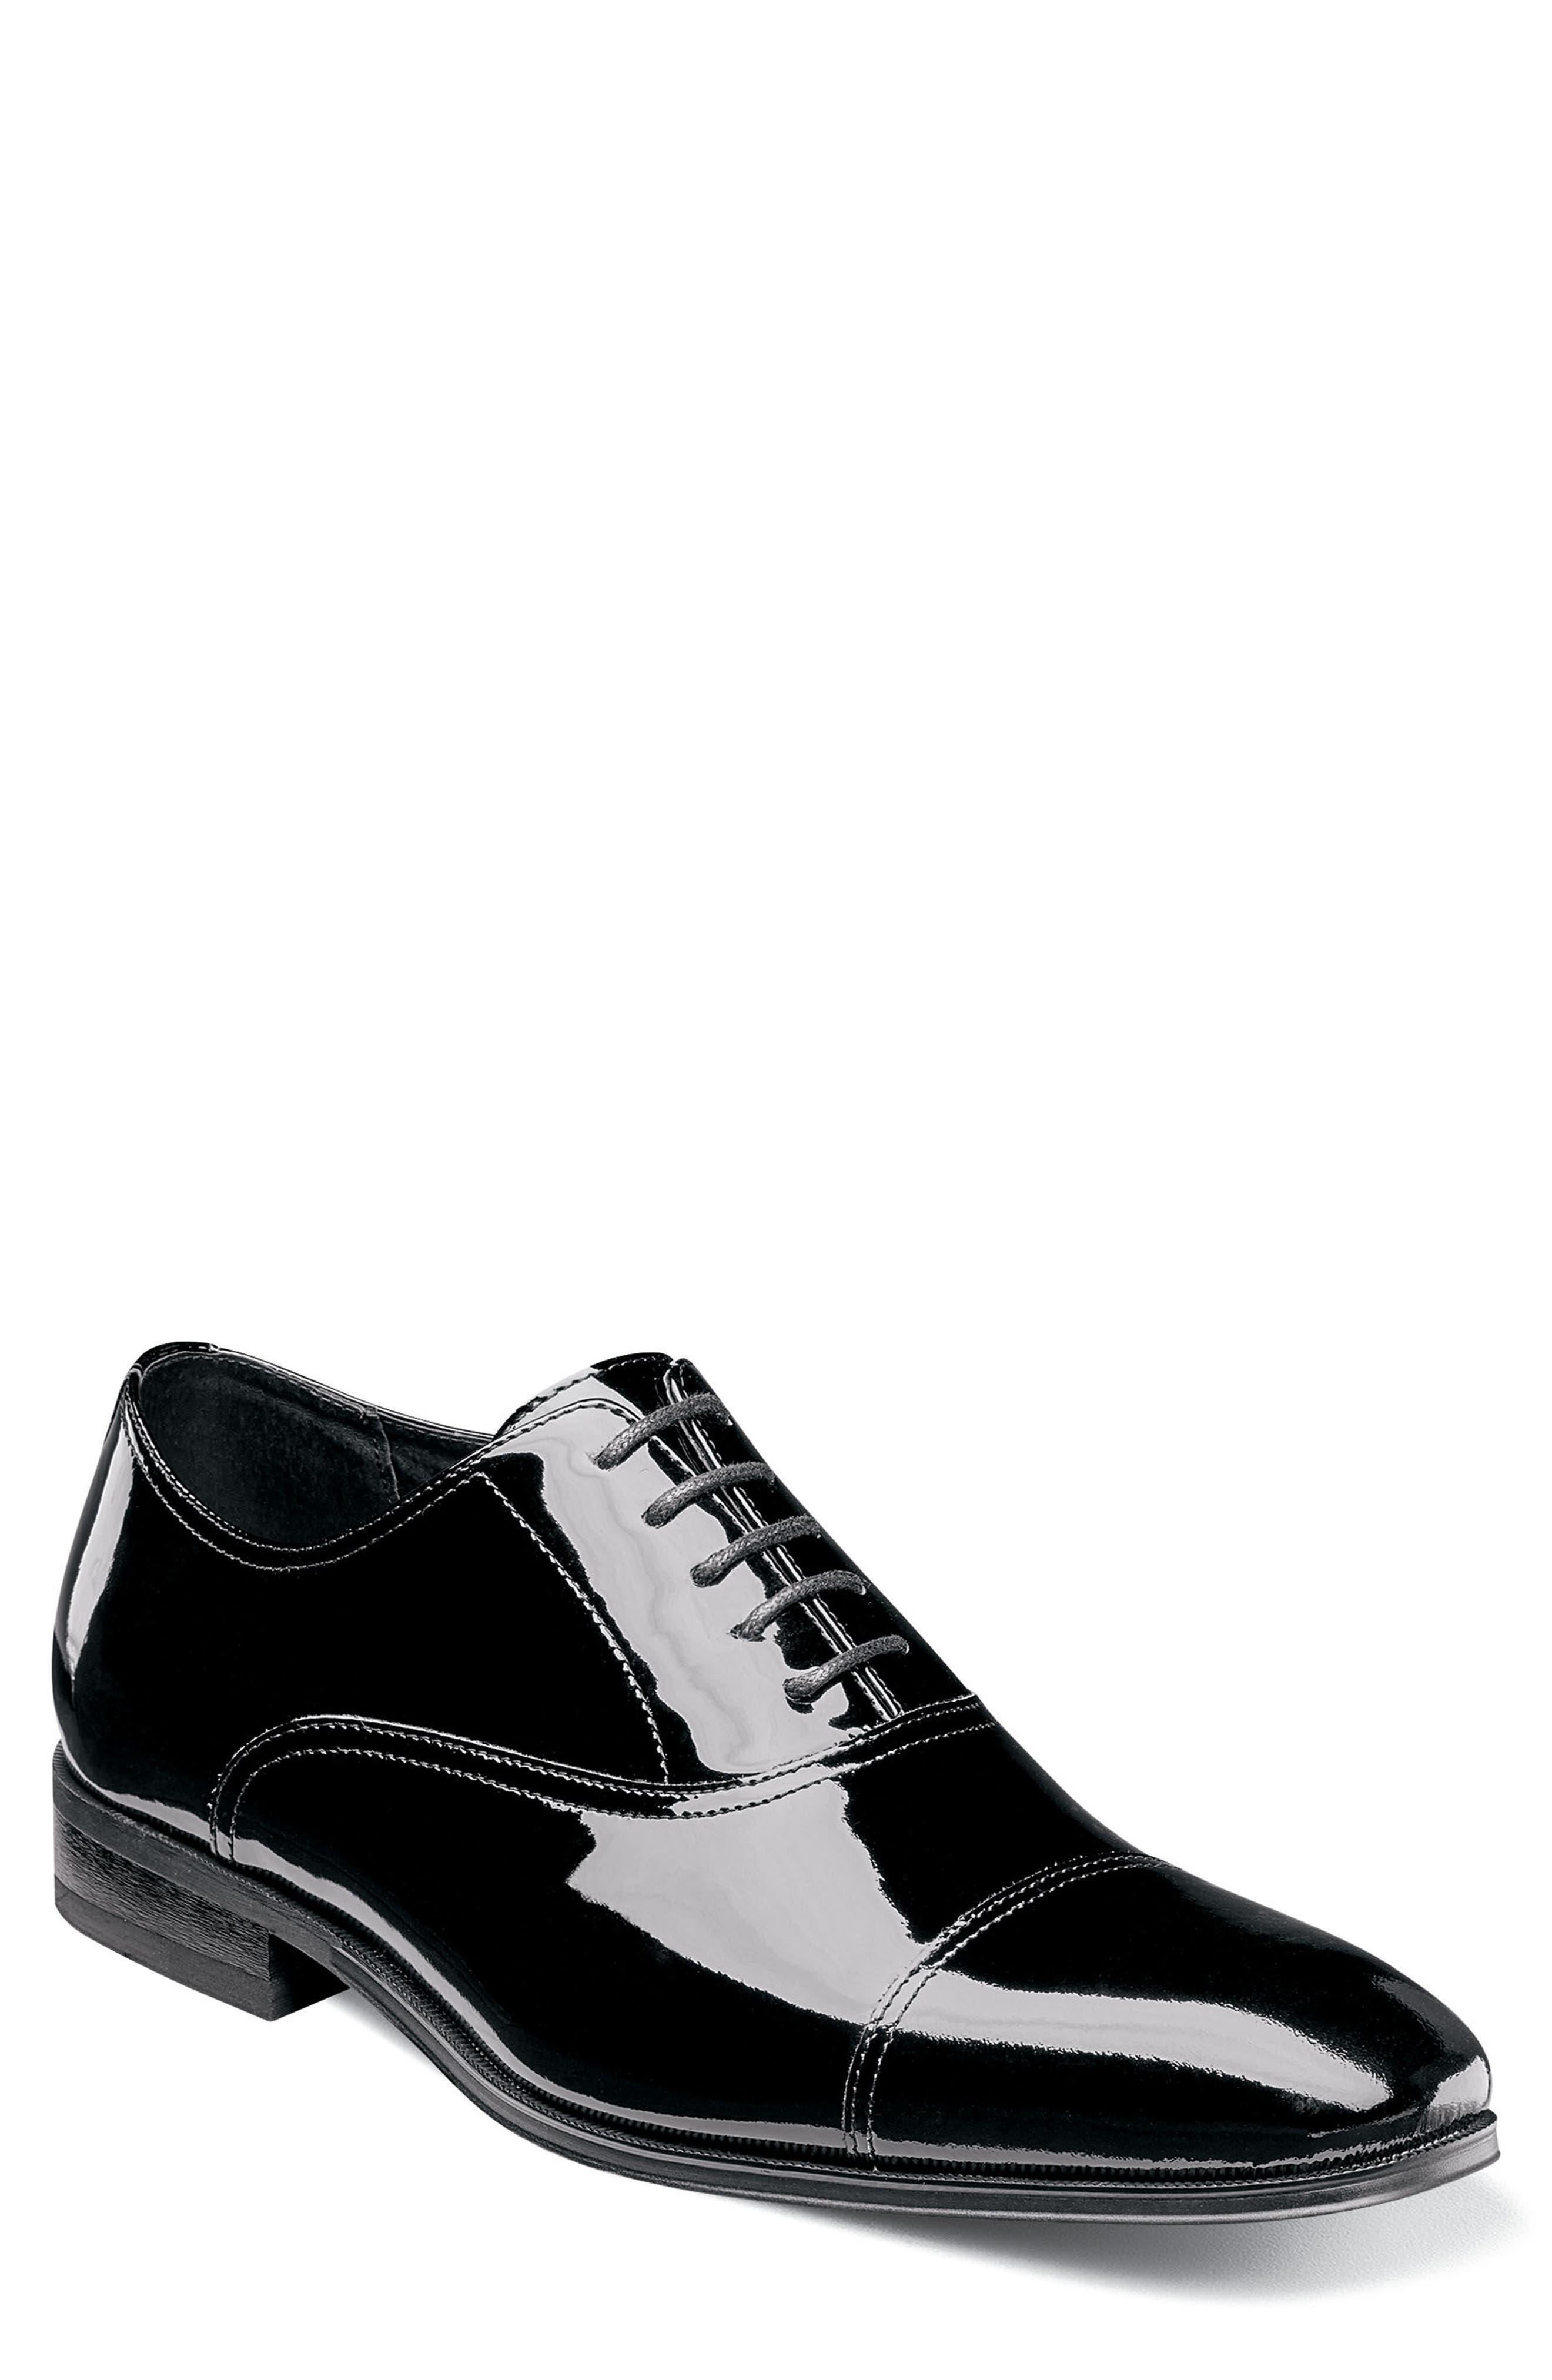 Tux Cap Toe Oxford,                         Main,                         color, BLACK PATENT LEATHER